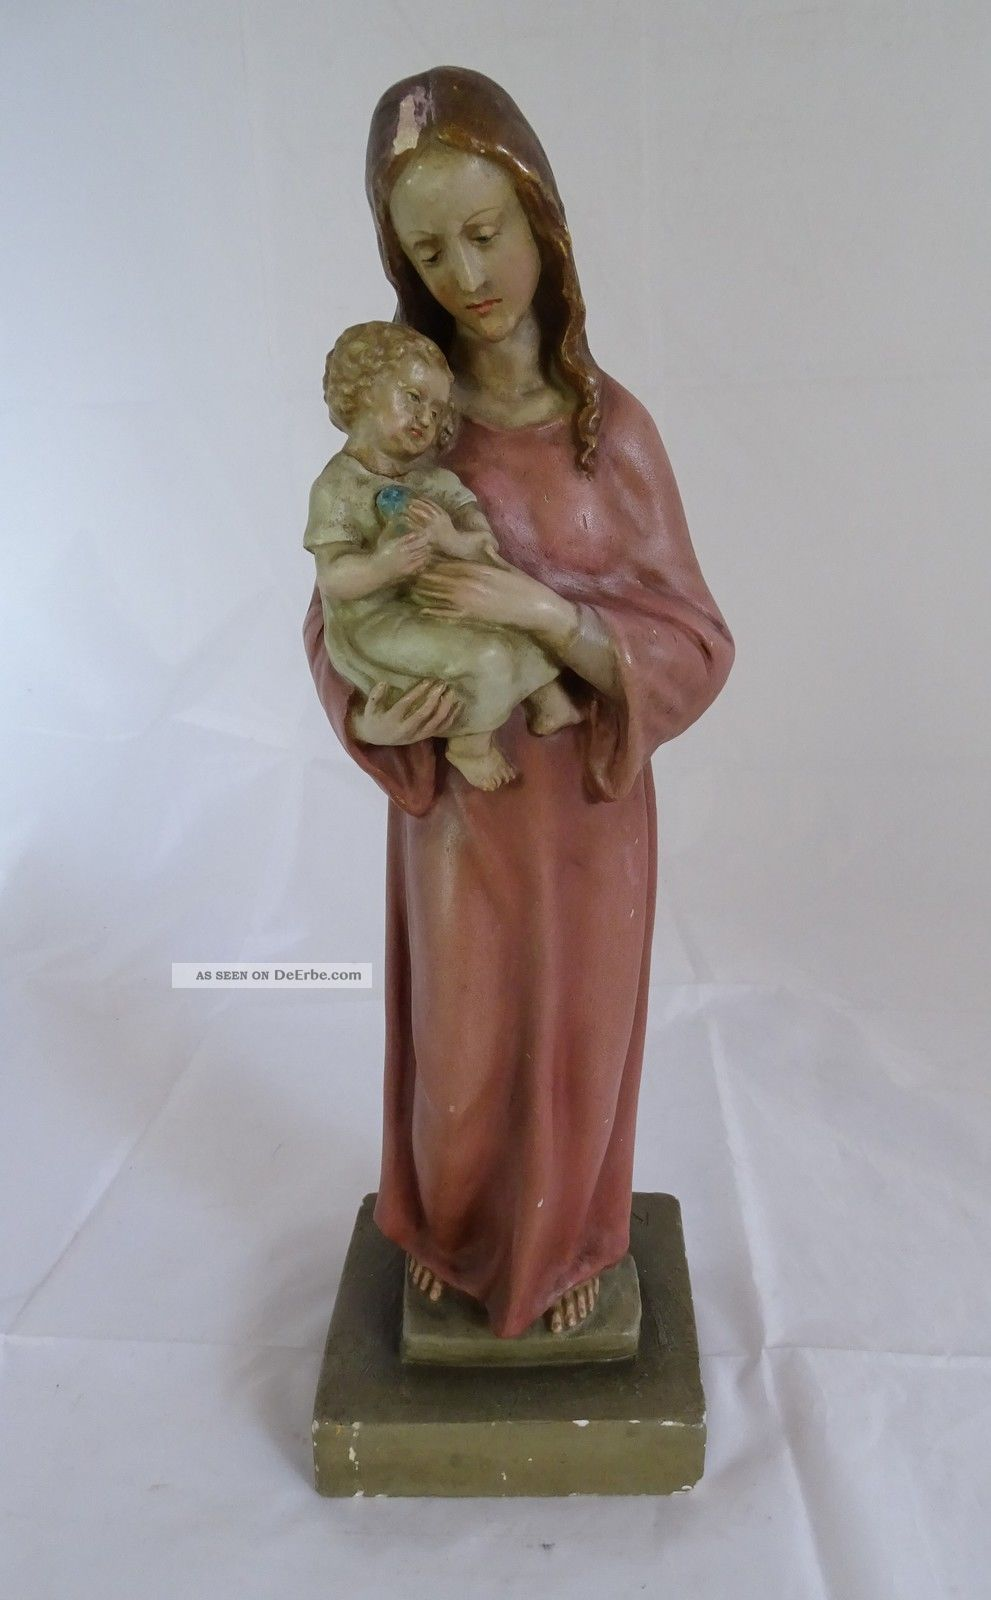 Antike Gips Plastik Madonna Mit Kind Hochwertige Handarbeit Sakrale Skulptur Skulpturen & Kruzifixe Bild